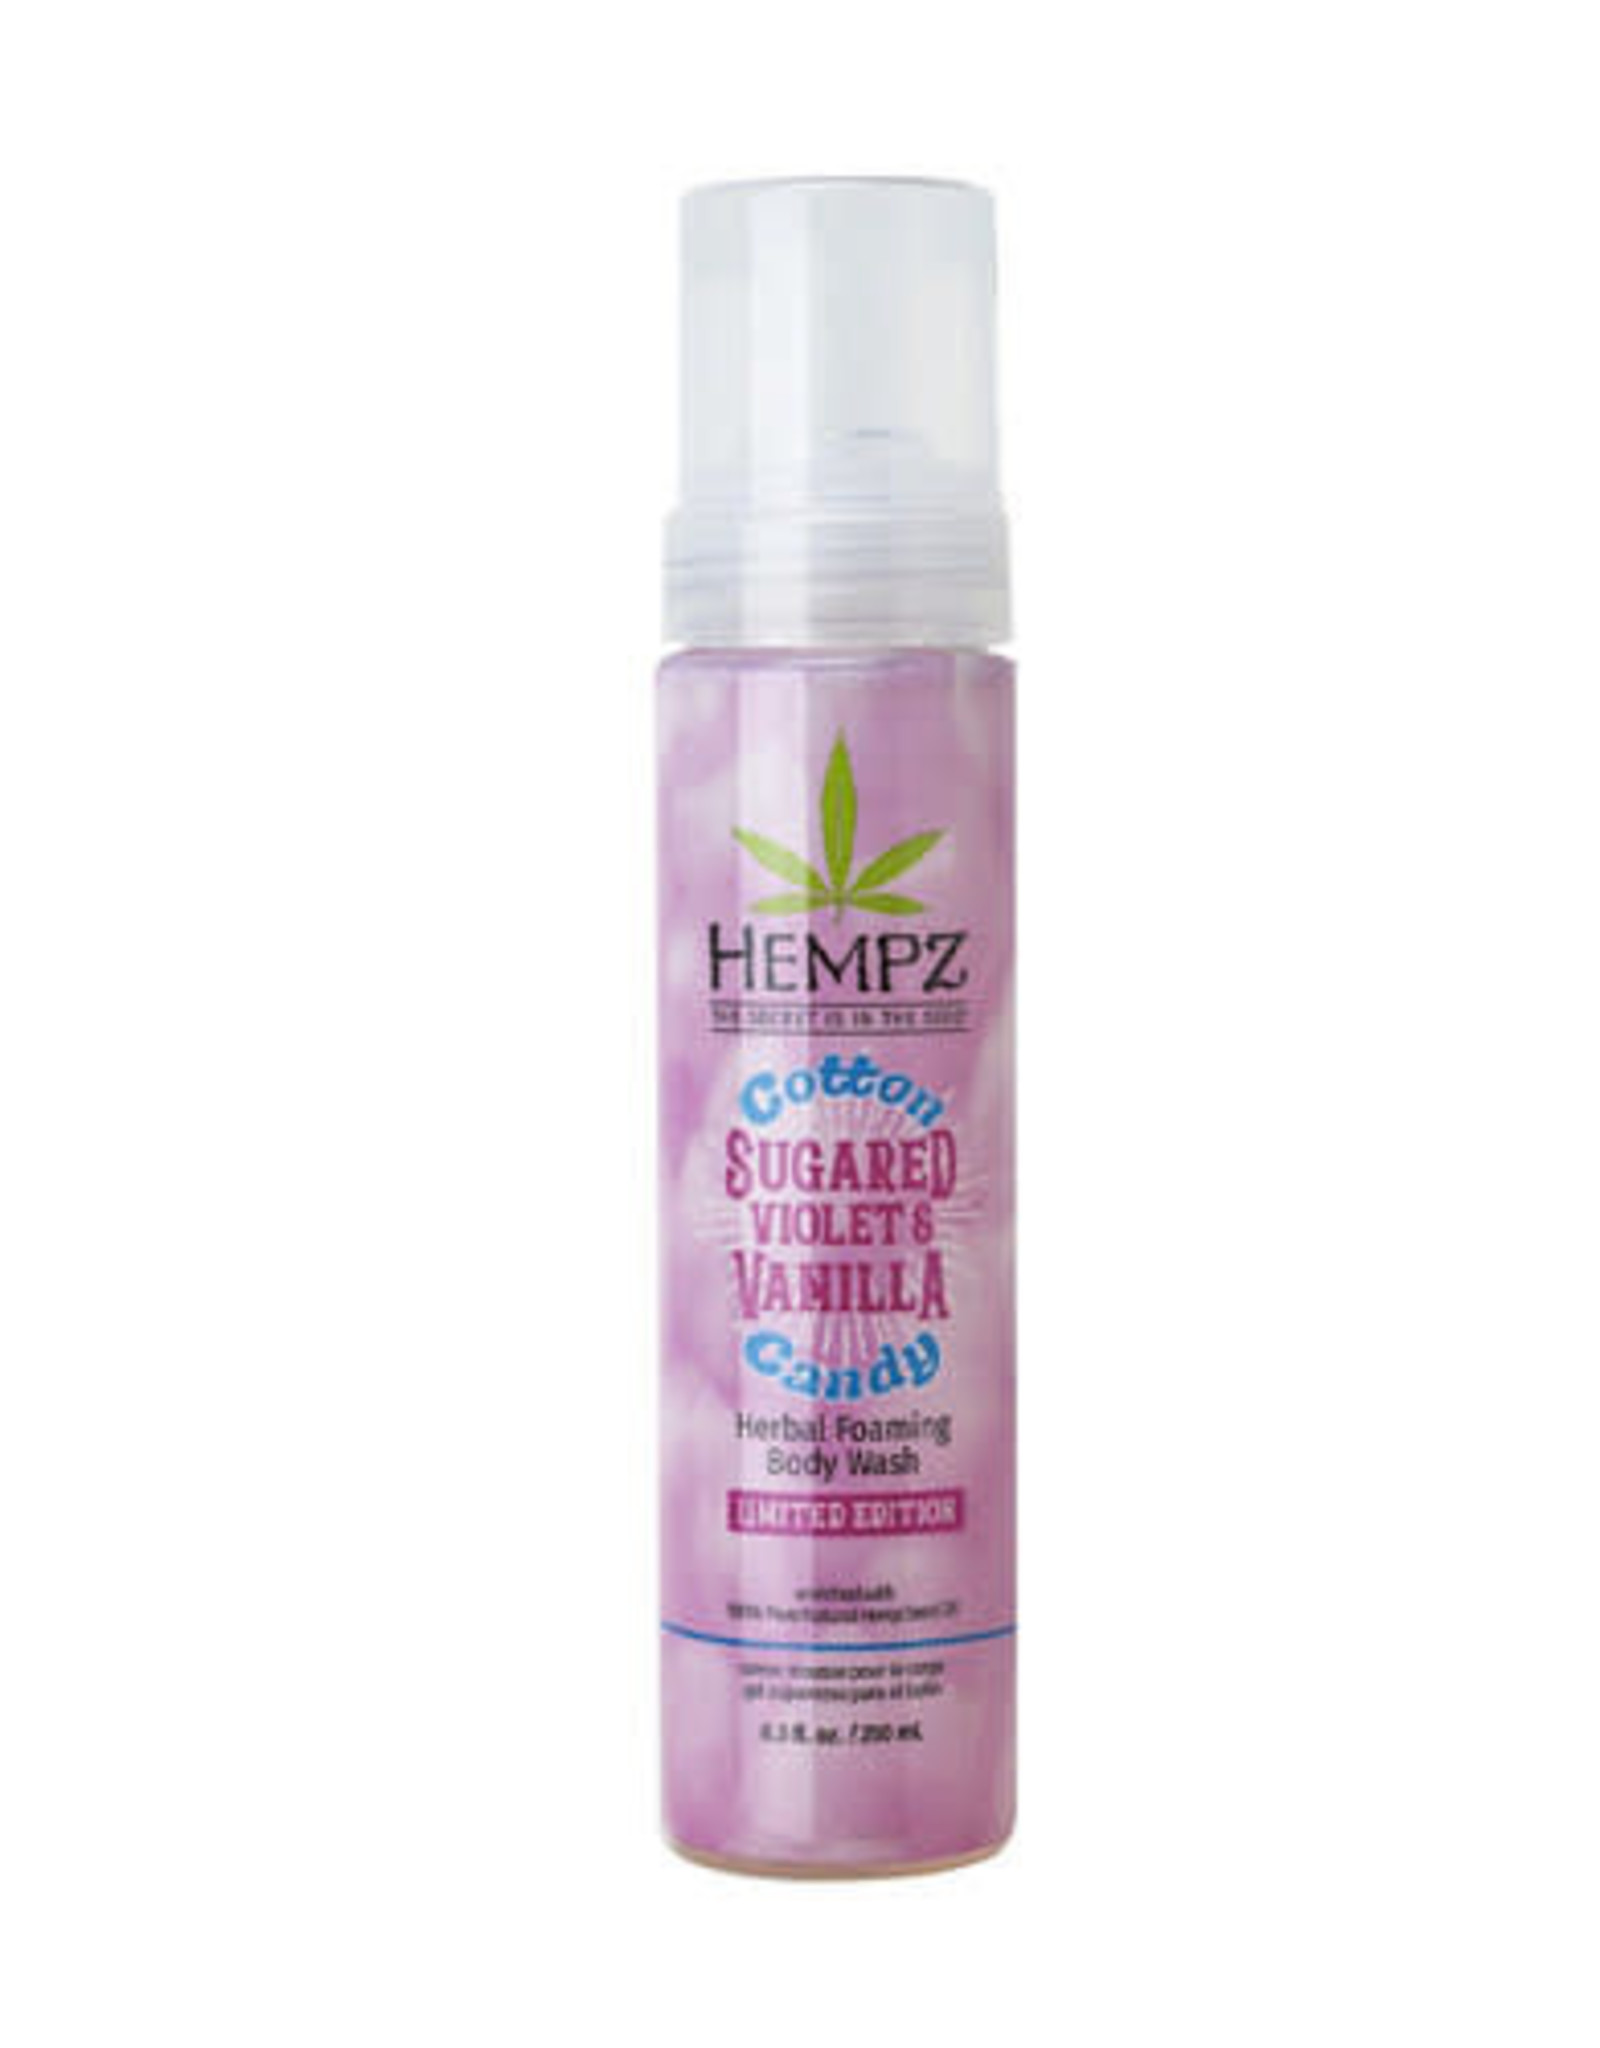 Hempz Foaming Herbal Body Wash 8.5oz Sugared Violet & Vanilla